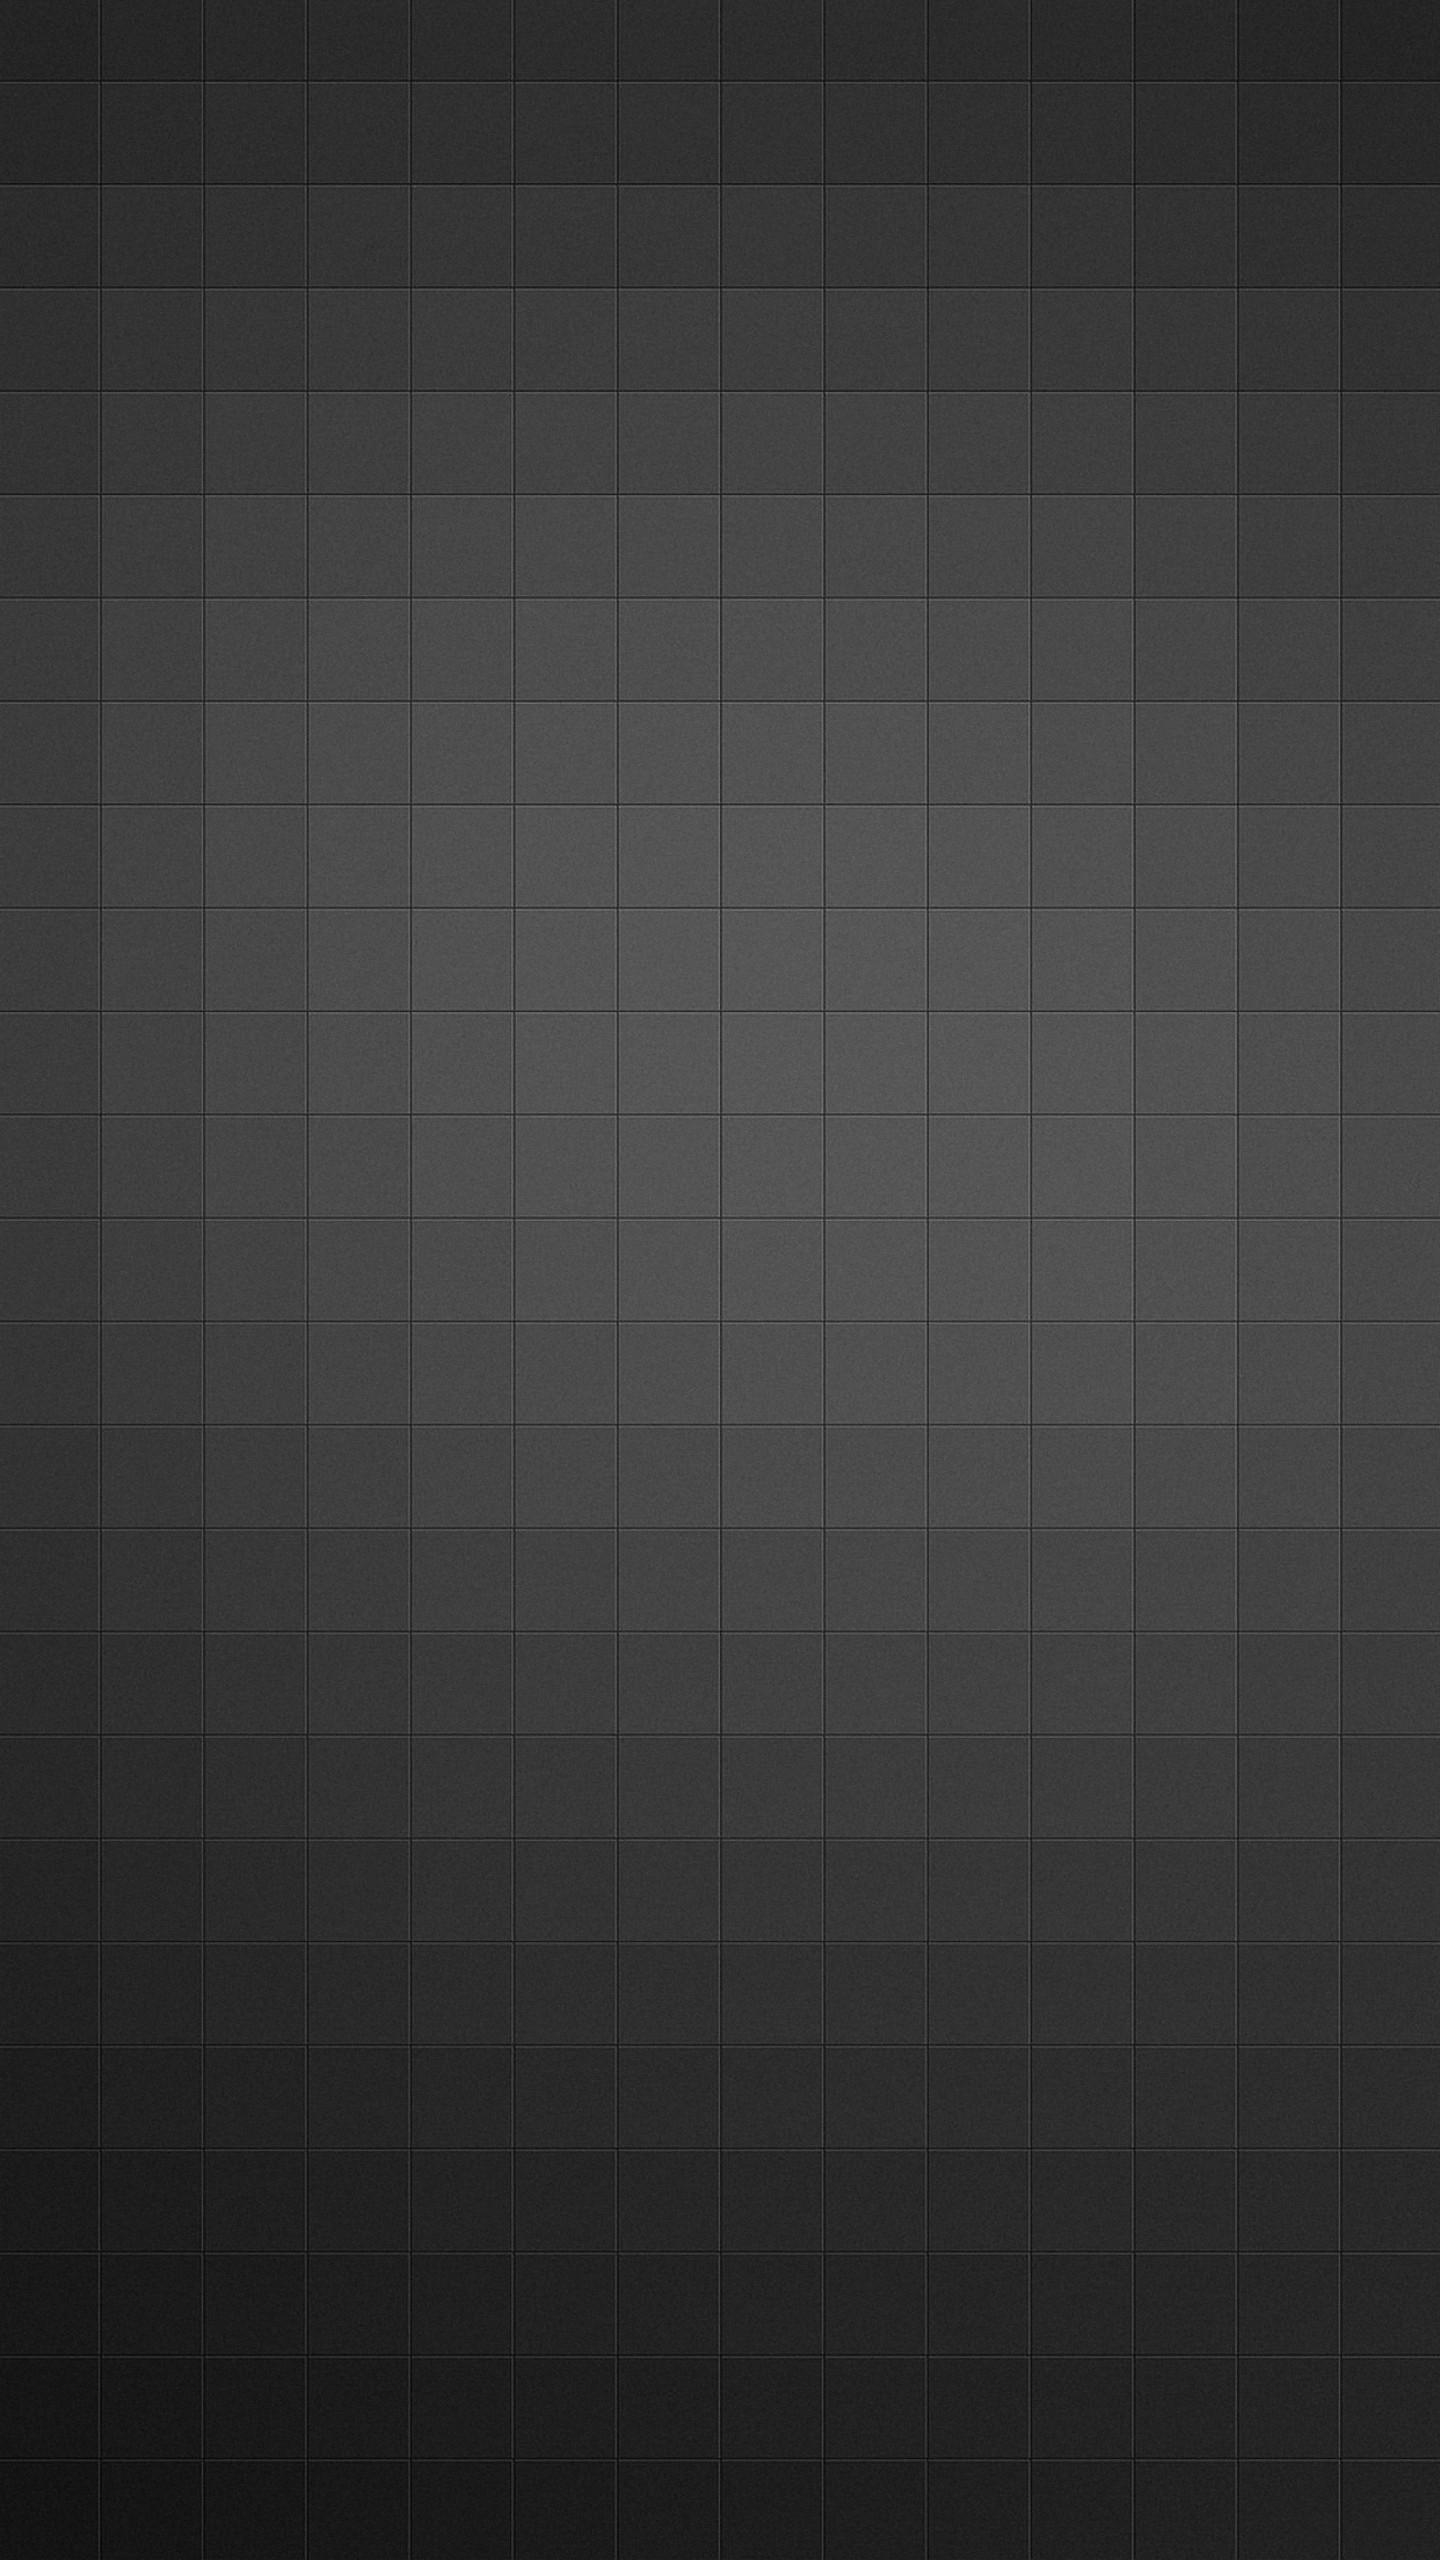 Dark Grey Wallpaper 25 Grey Iphone Wallpaper Hd 1440x2560 Wallpaper Teahub Io